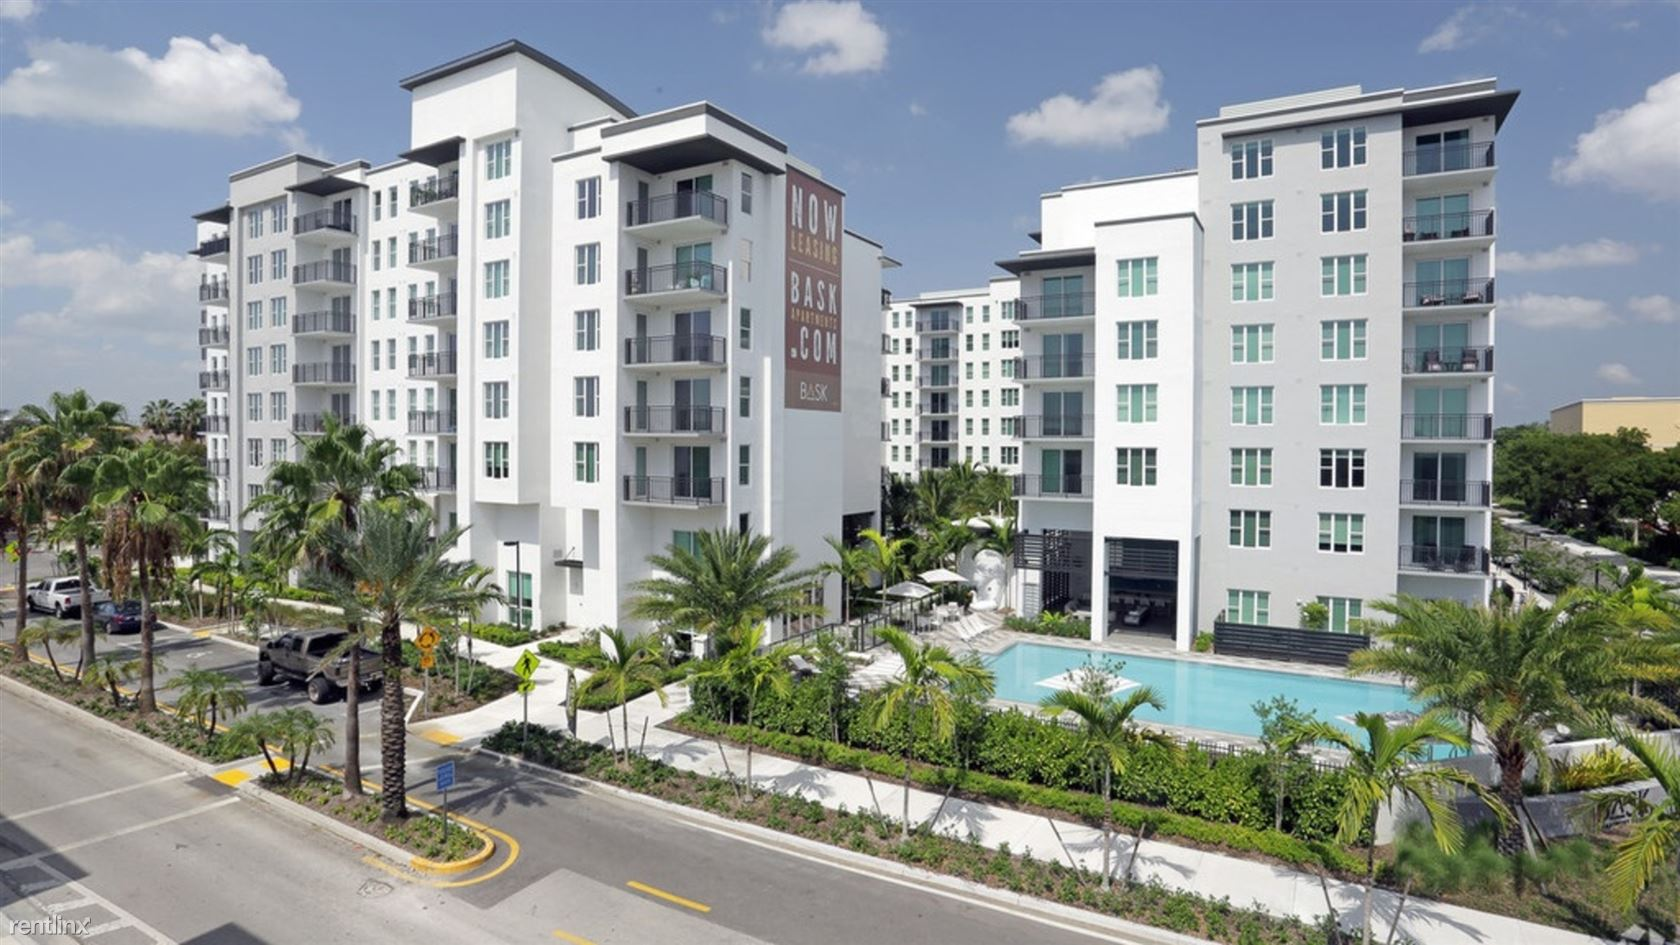 1900 SE 10th Ave, Ft. Lauderdale, FL - $2,776